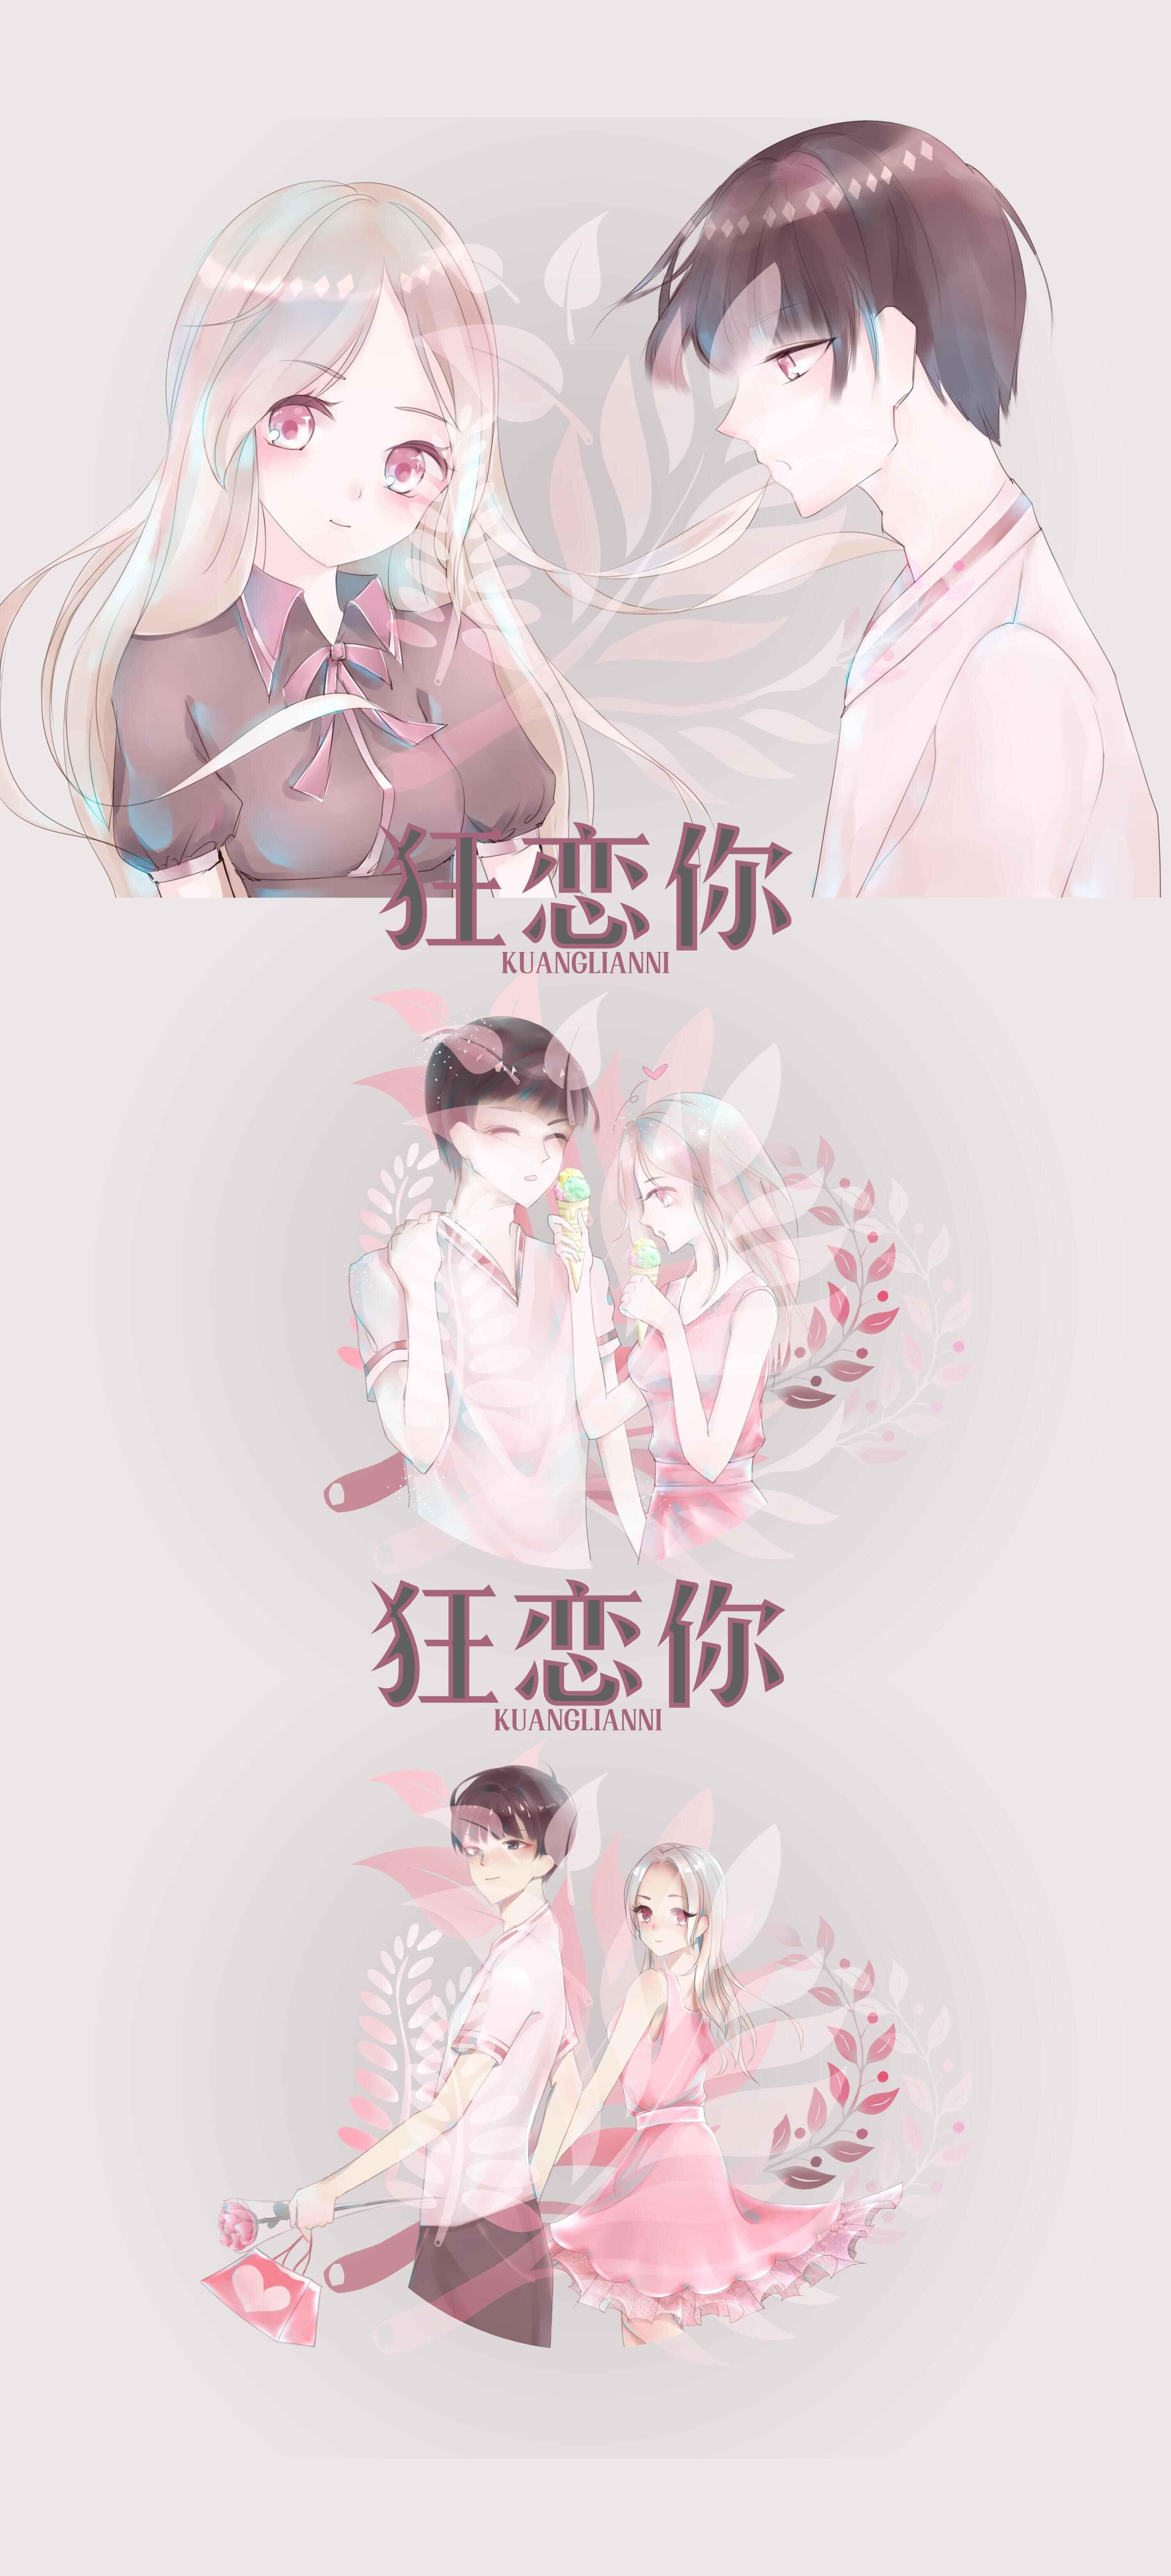 狂恋你(cover:every little thing)